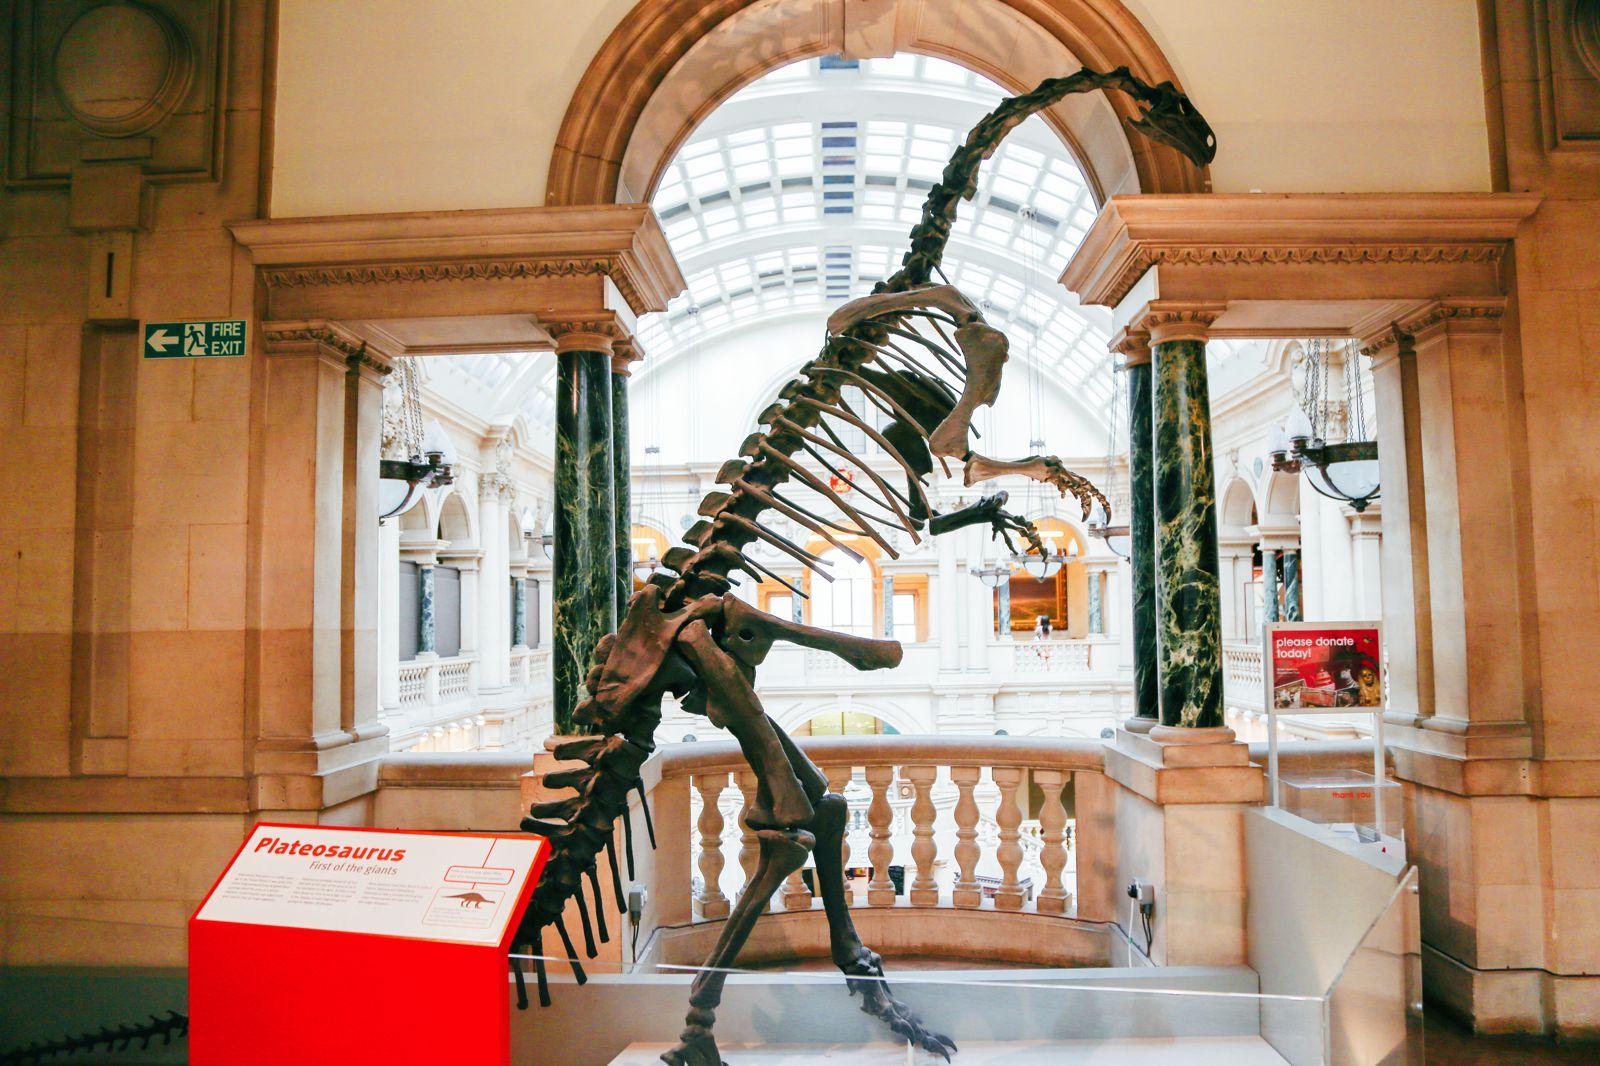 Gothic Bristol, Vintage Cameras, Dinosaurs And Trolls! (27)